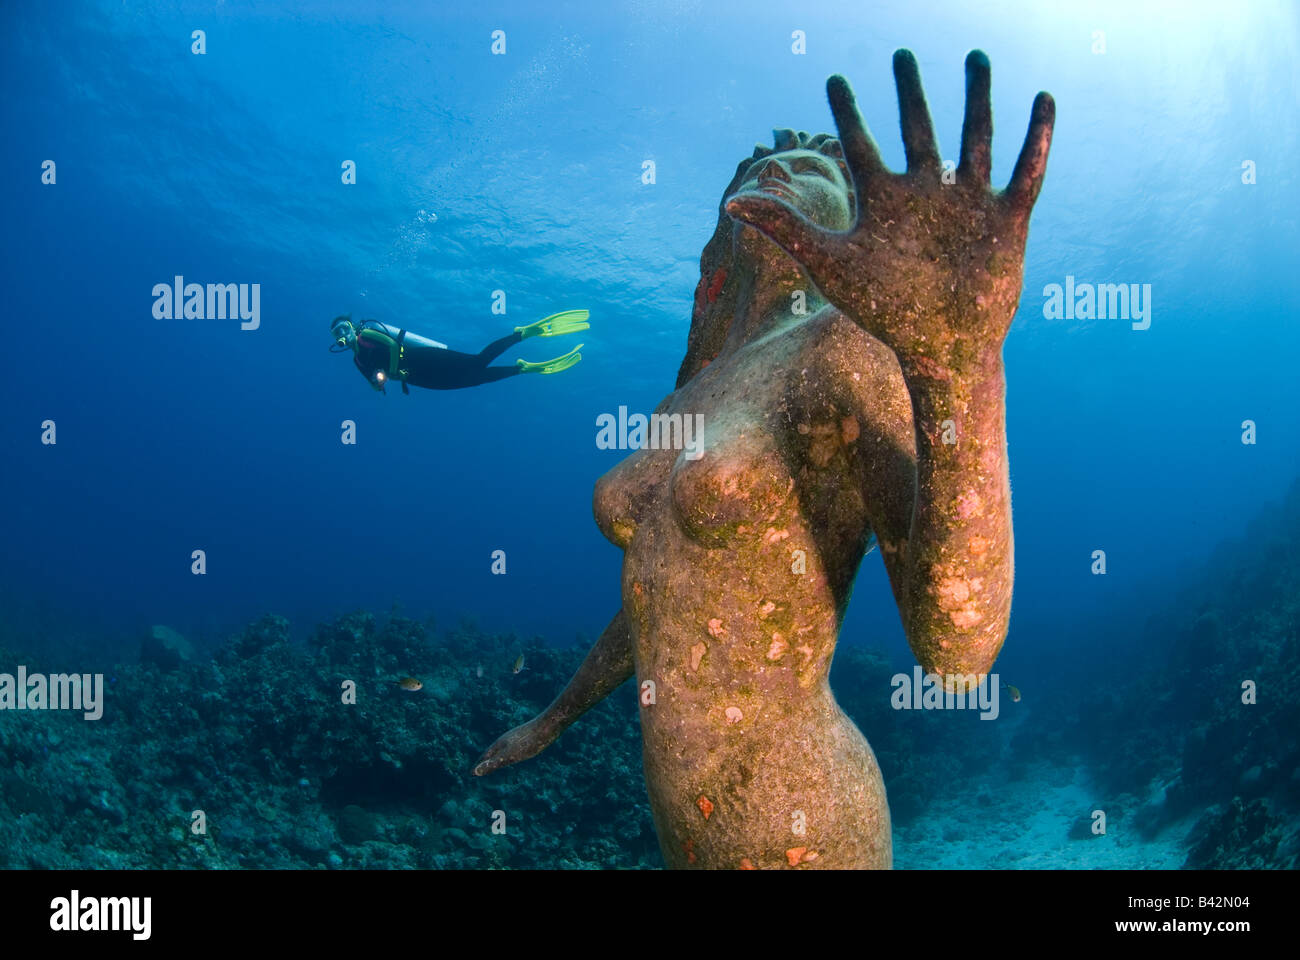 Meerjungfrau-Skulptur und Taucher Grand Cayman Karibik-Cayman-Inseln Stockbild